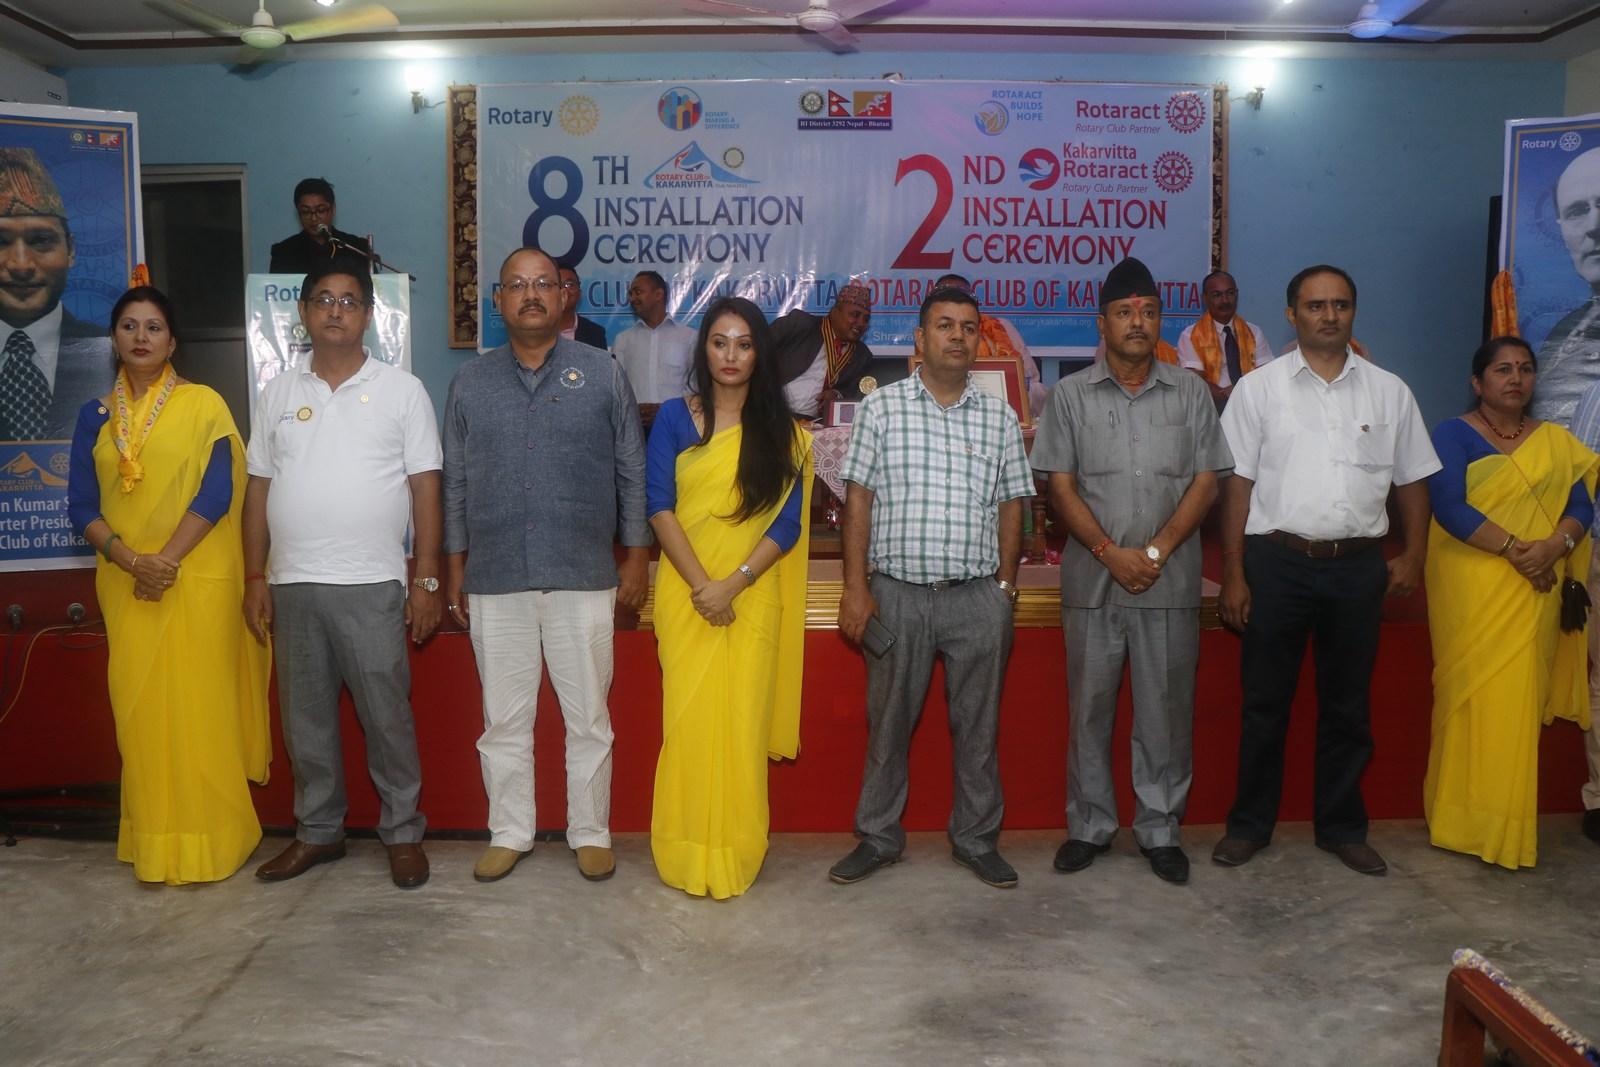 8th-Installation-Ceremony-Rotary-Club-of-Kakarvitta-41